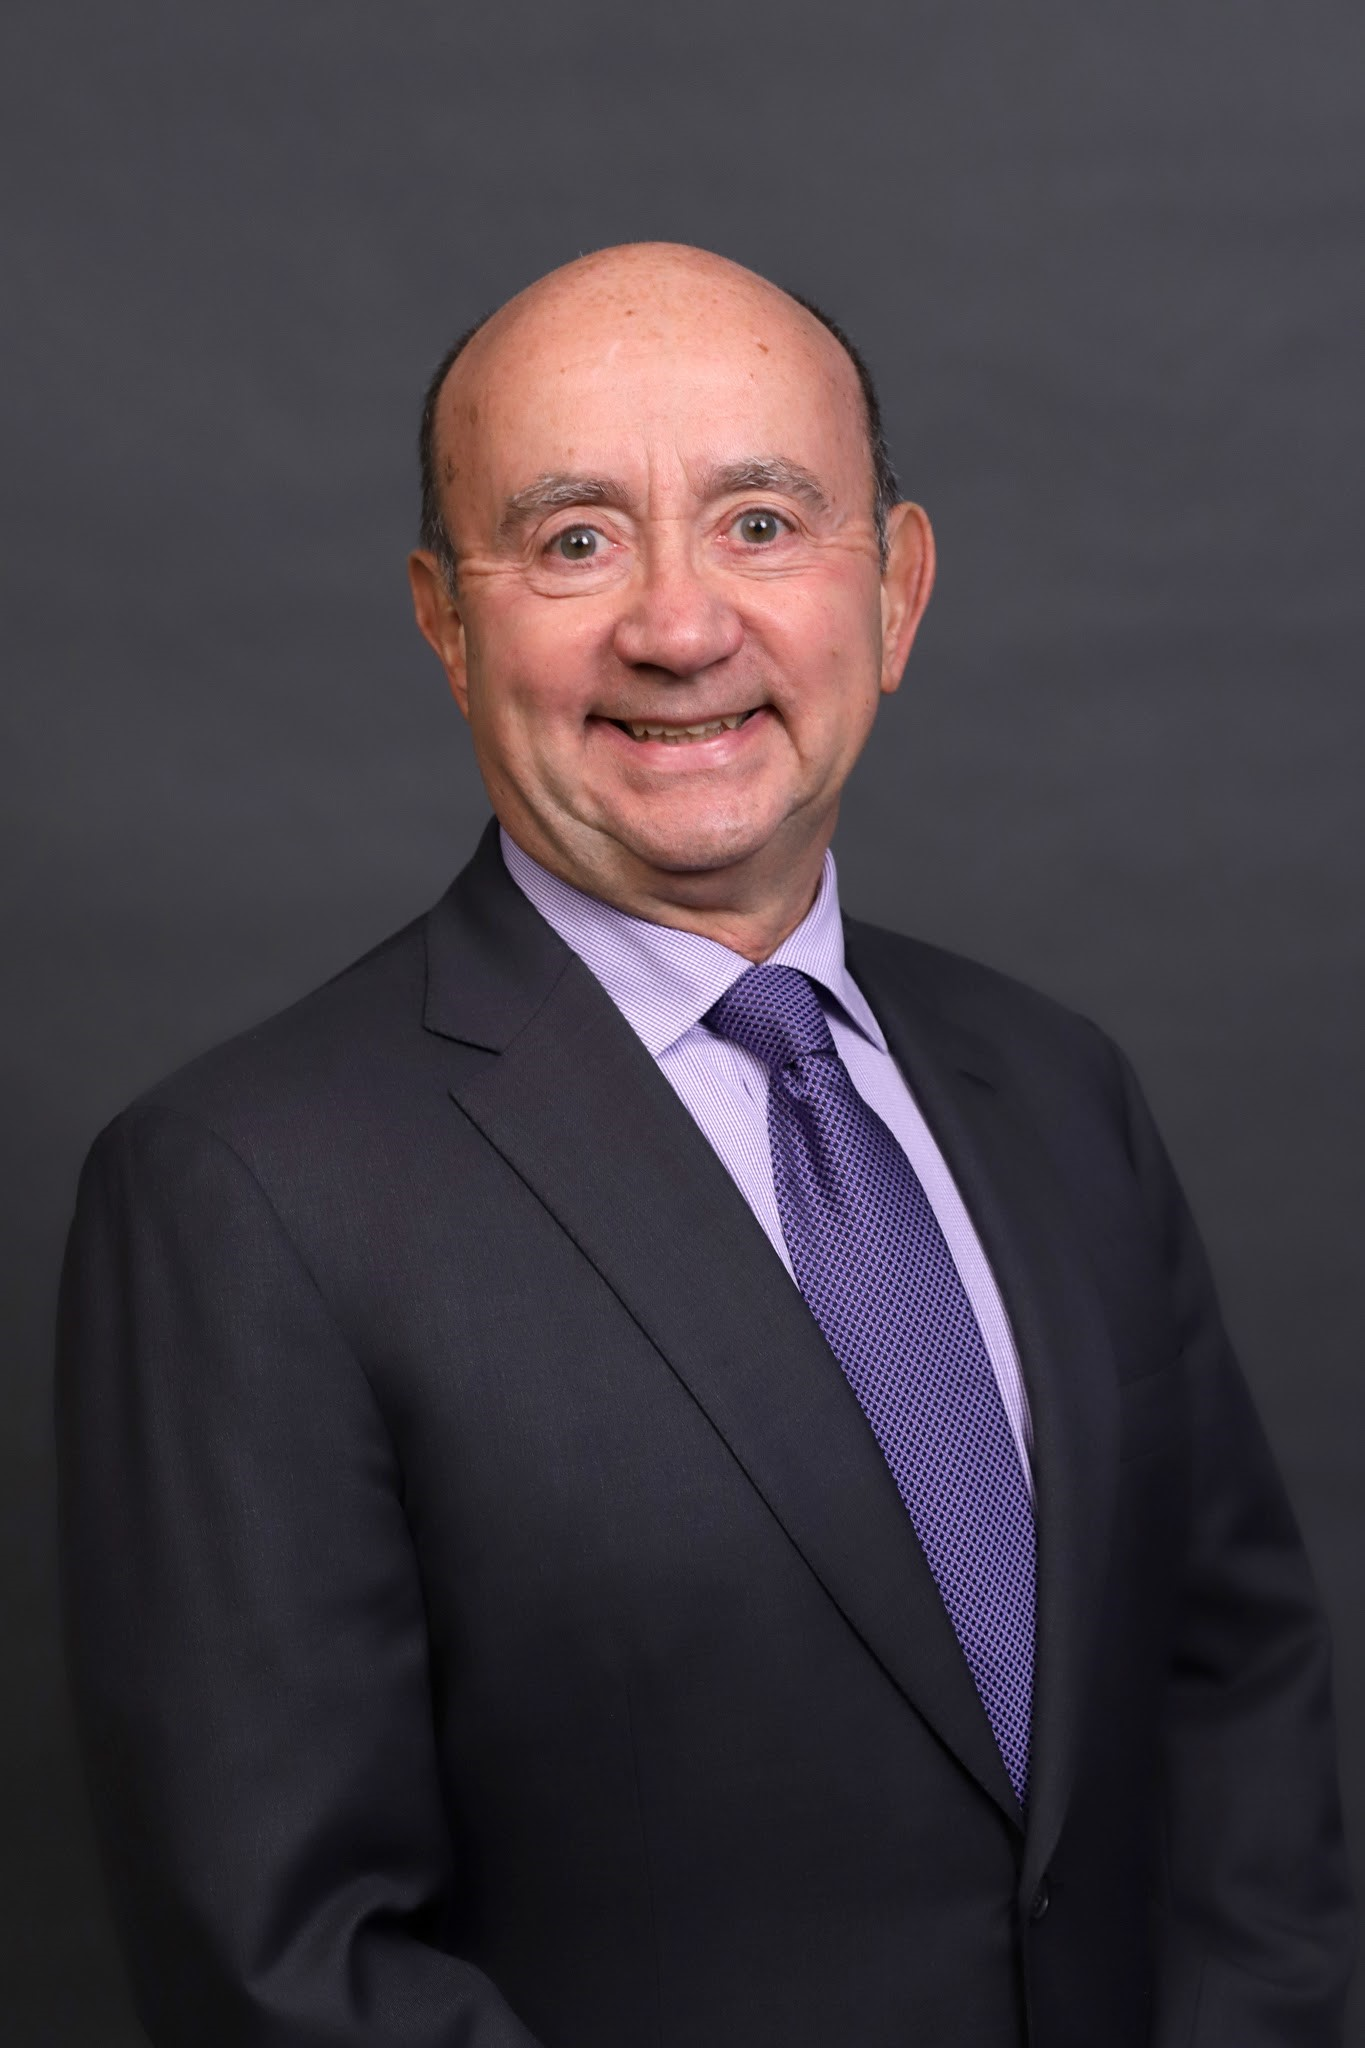 Leonard DeLuca